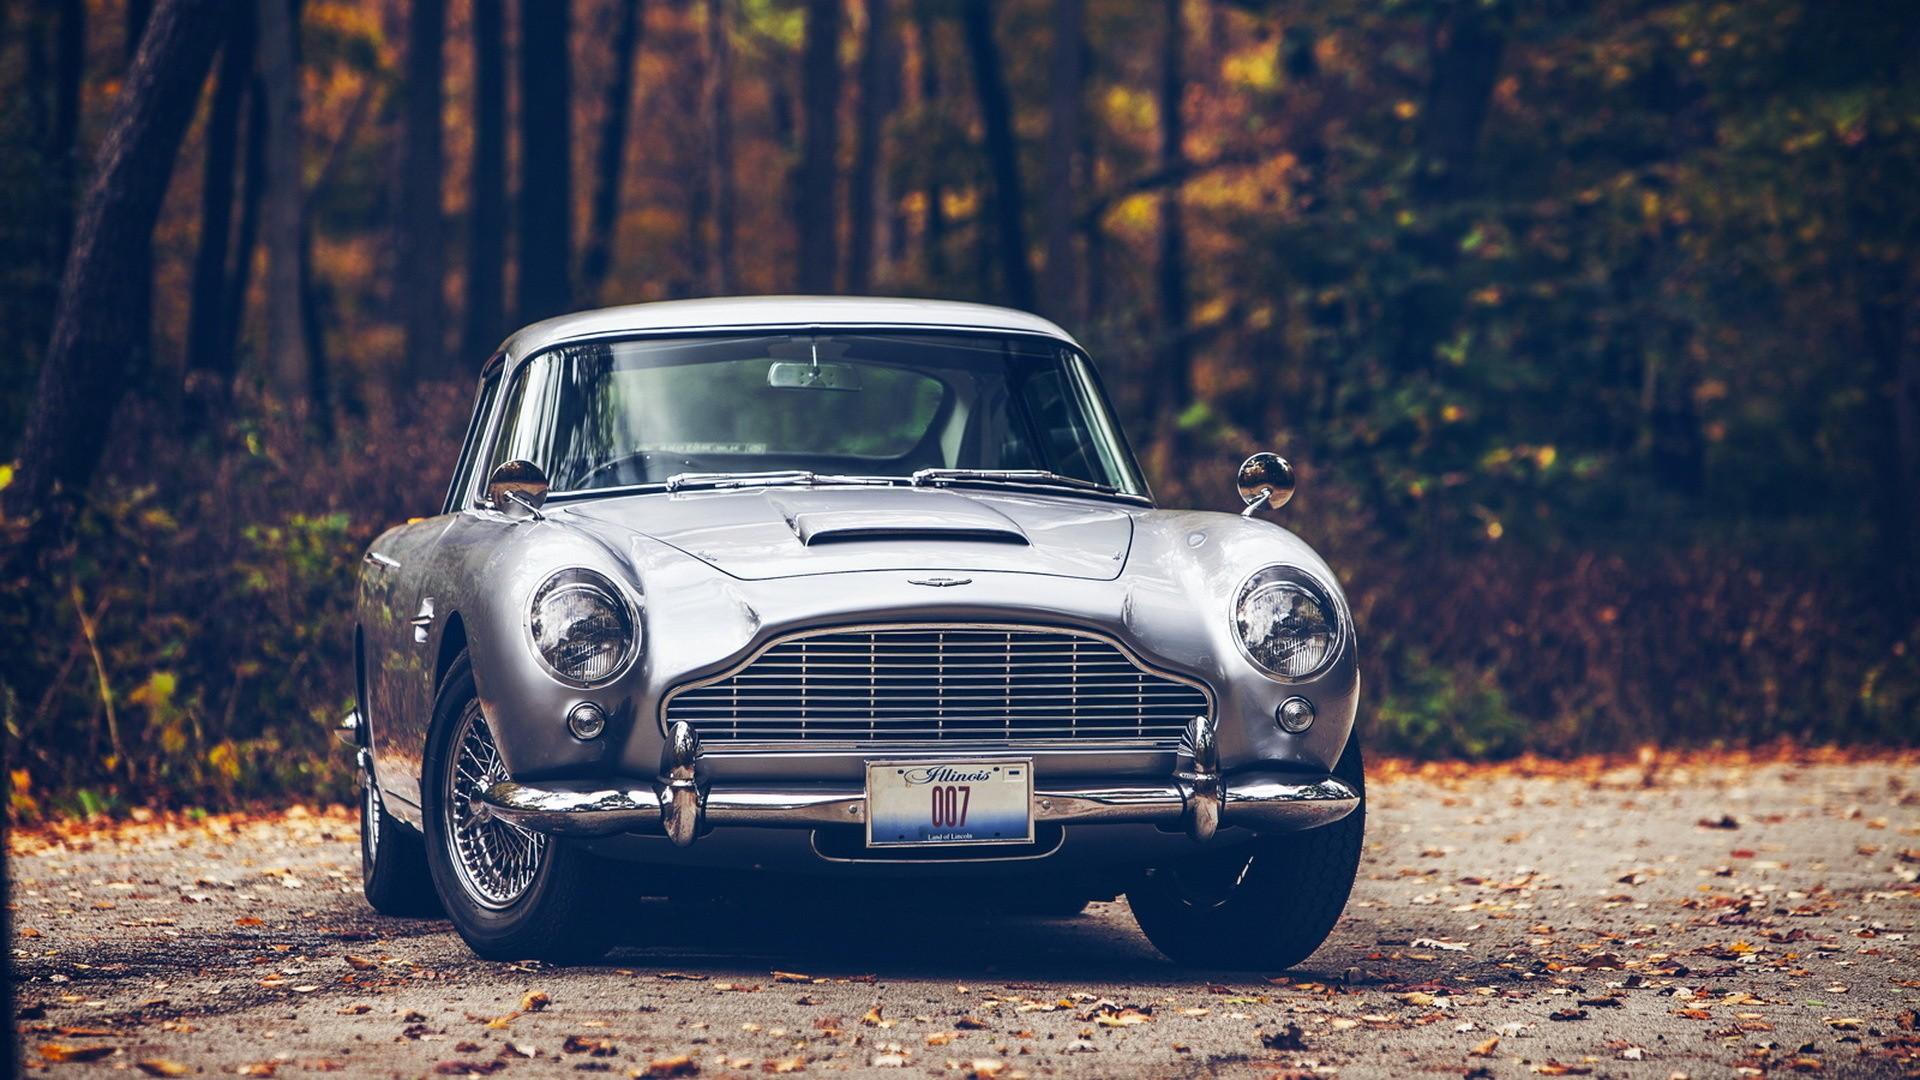 Wallpaper Sports Car Aston Martin Vintage Car Classic Car - Aston martin vintage